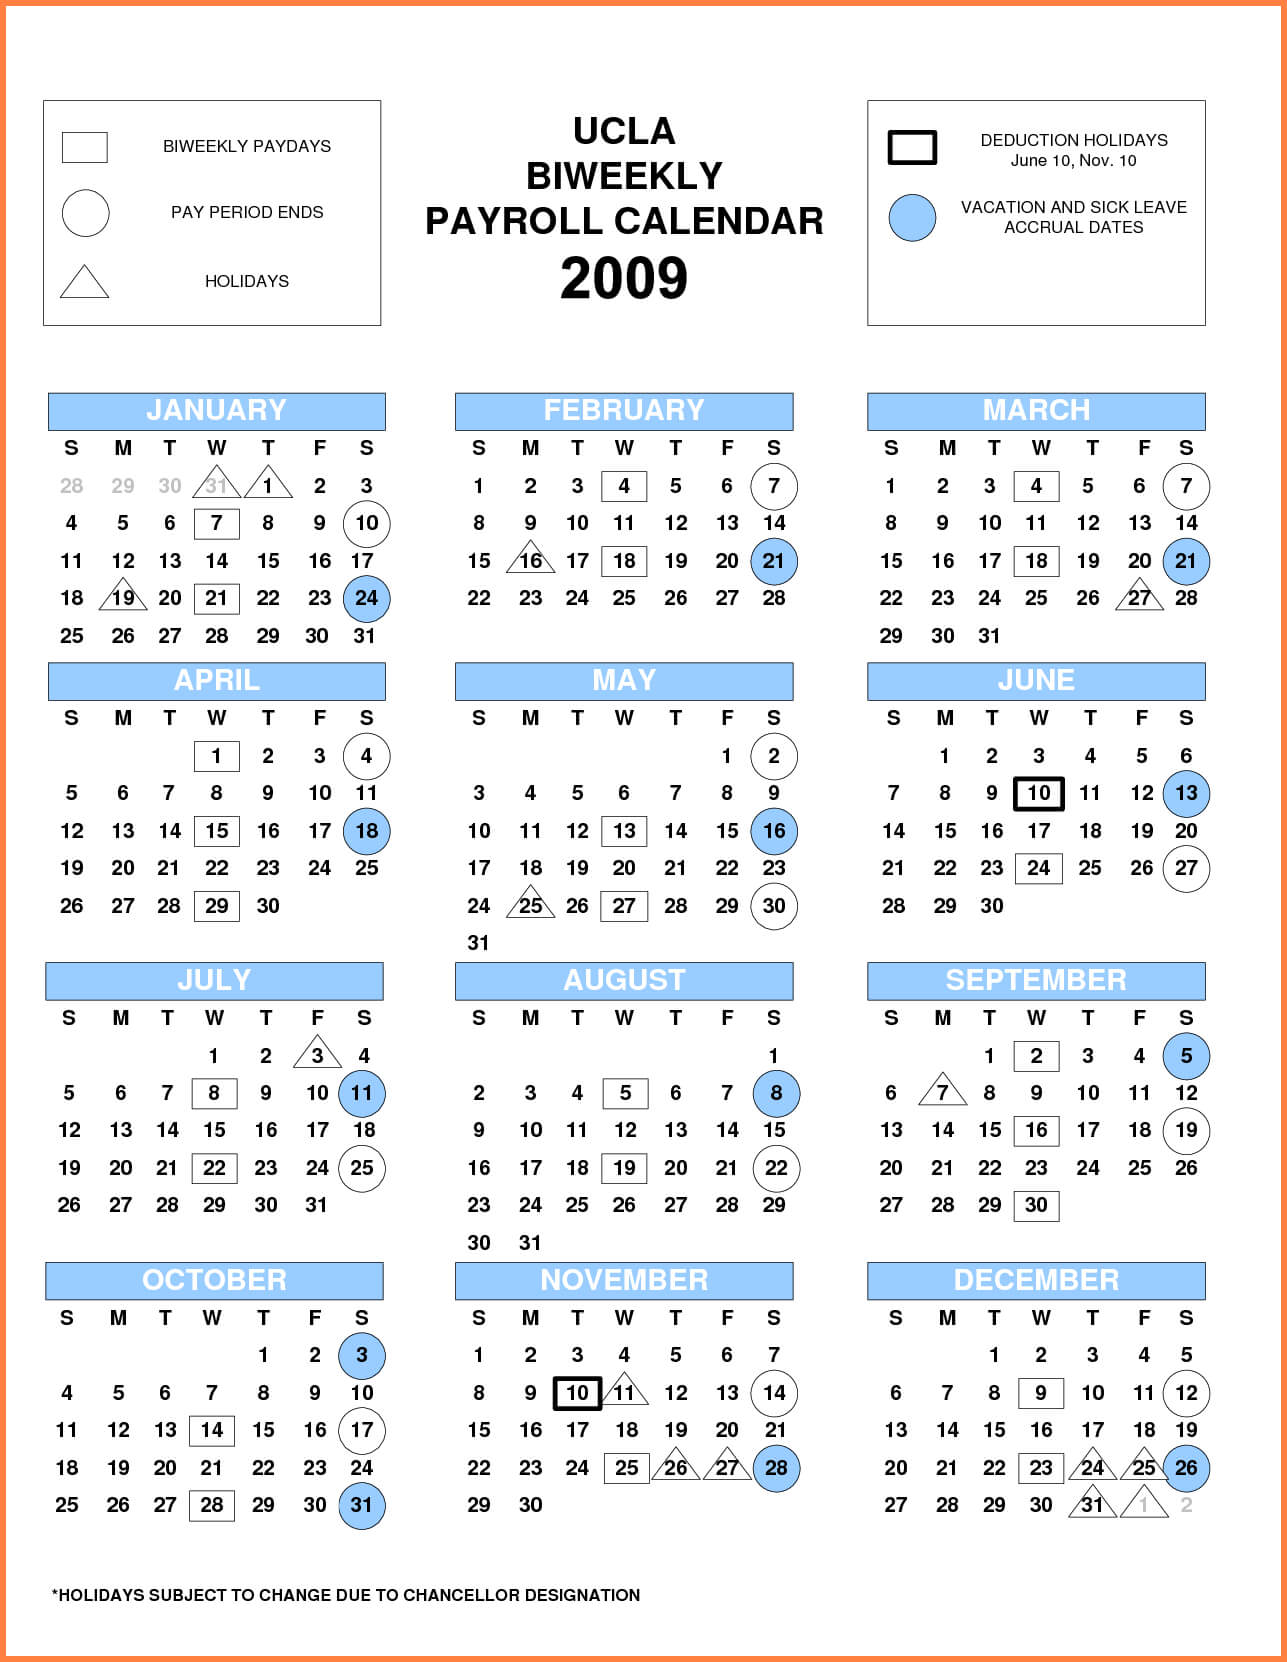 Fresh 2017 Biweekly Payroll Calendar Template With Regard To 2017 Biweekly Payroll Calendar Template